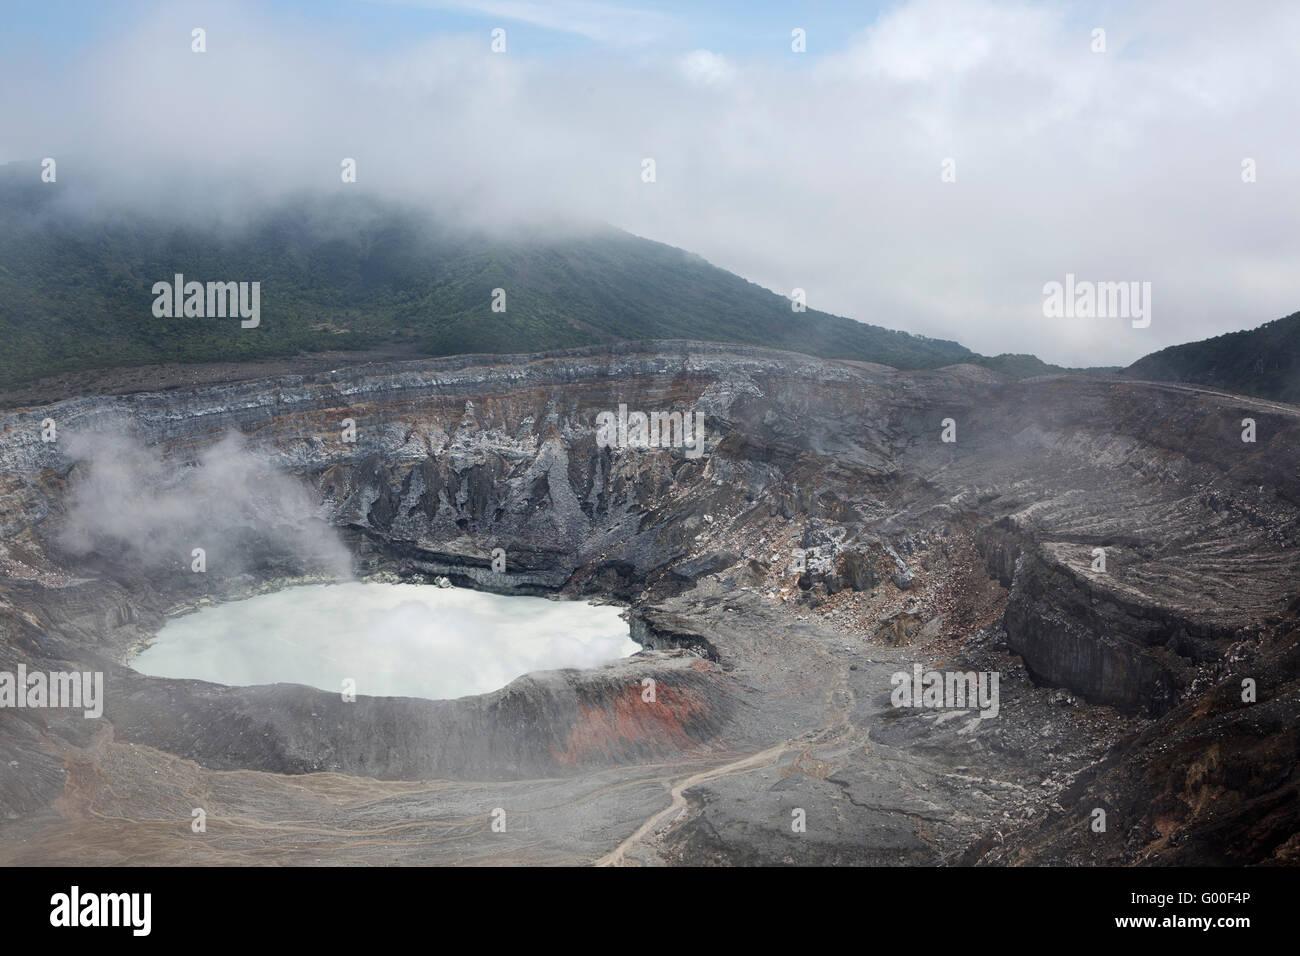 The crater of Poas Volcano in Parque Nacional Volcan Poas (Poas Volcano National Park) in Costa Rica. - Stock Image